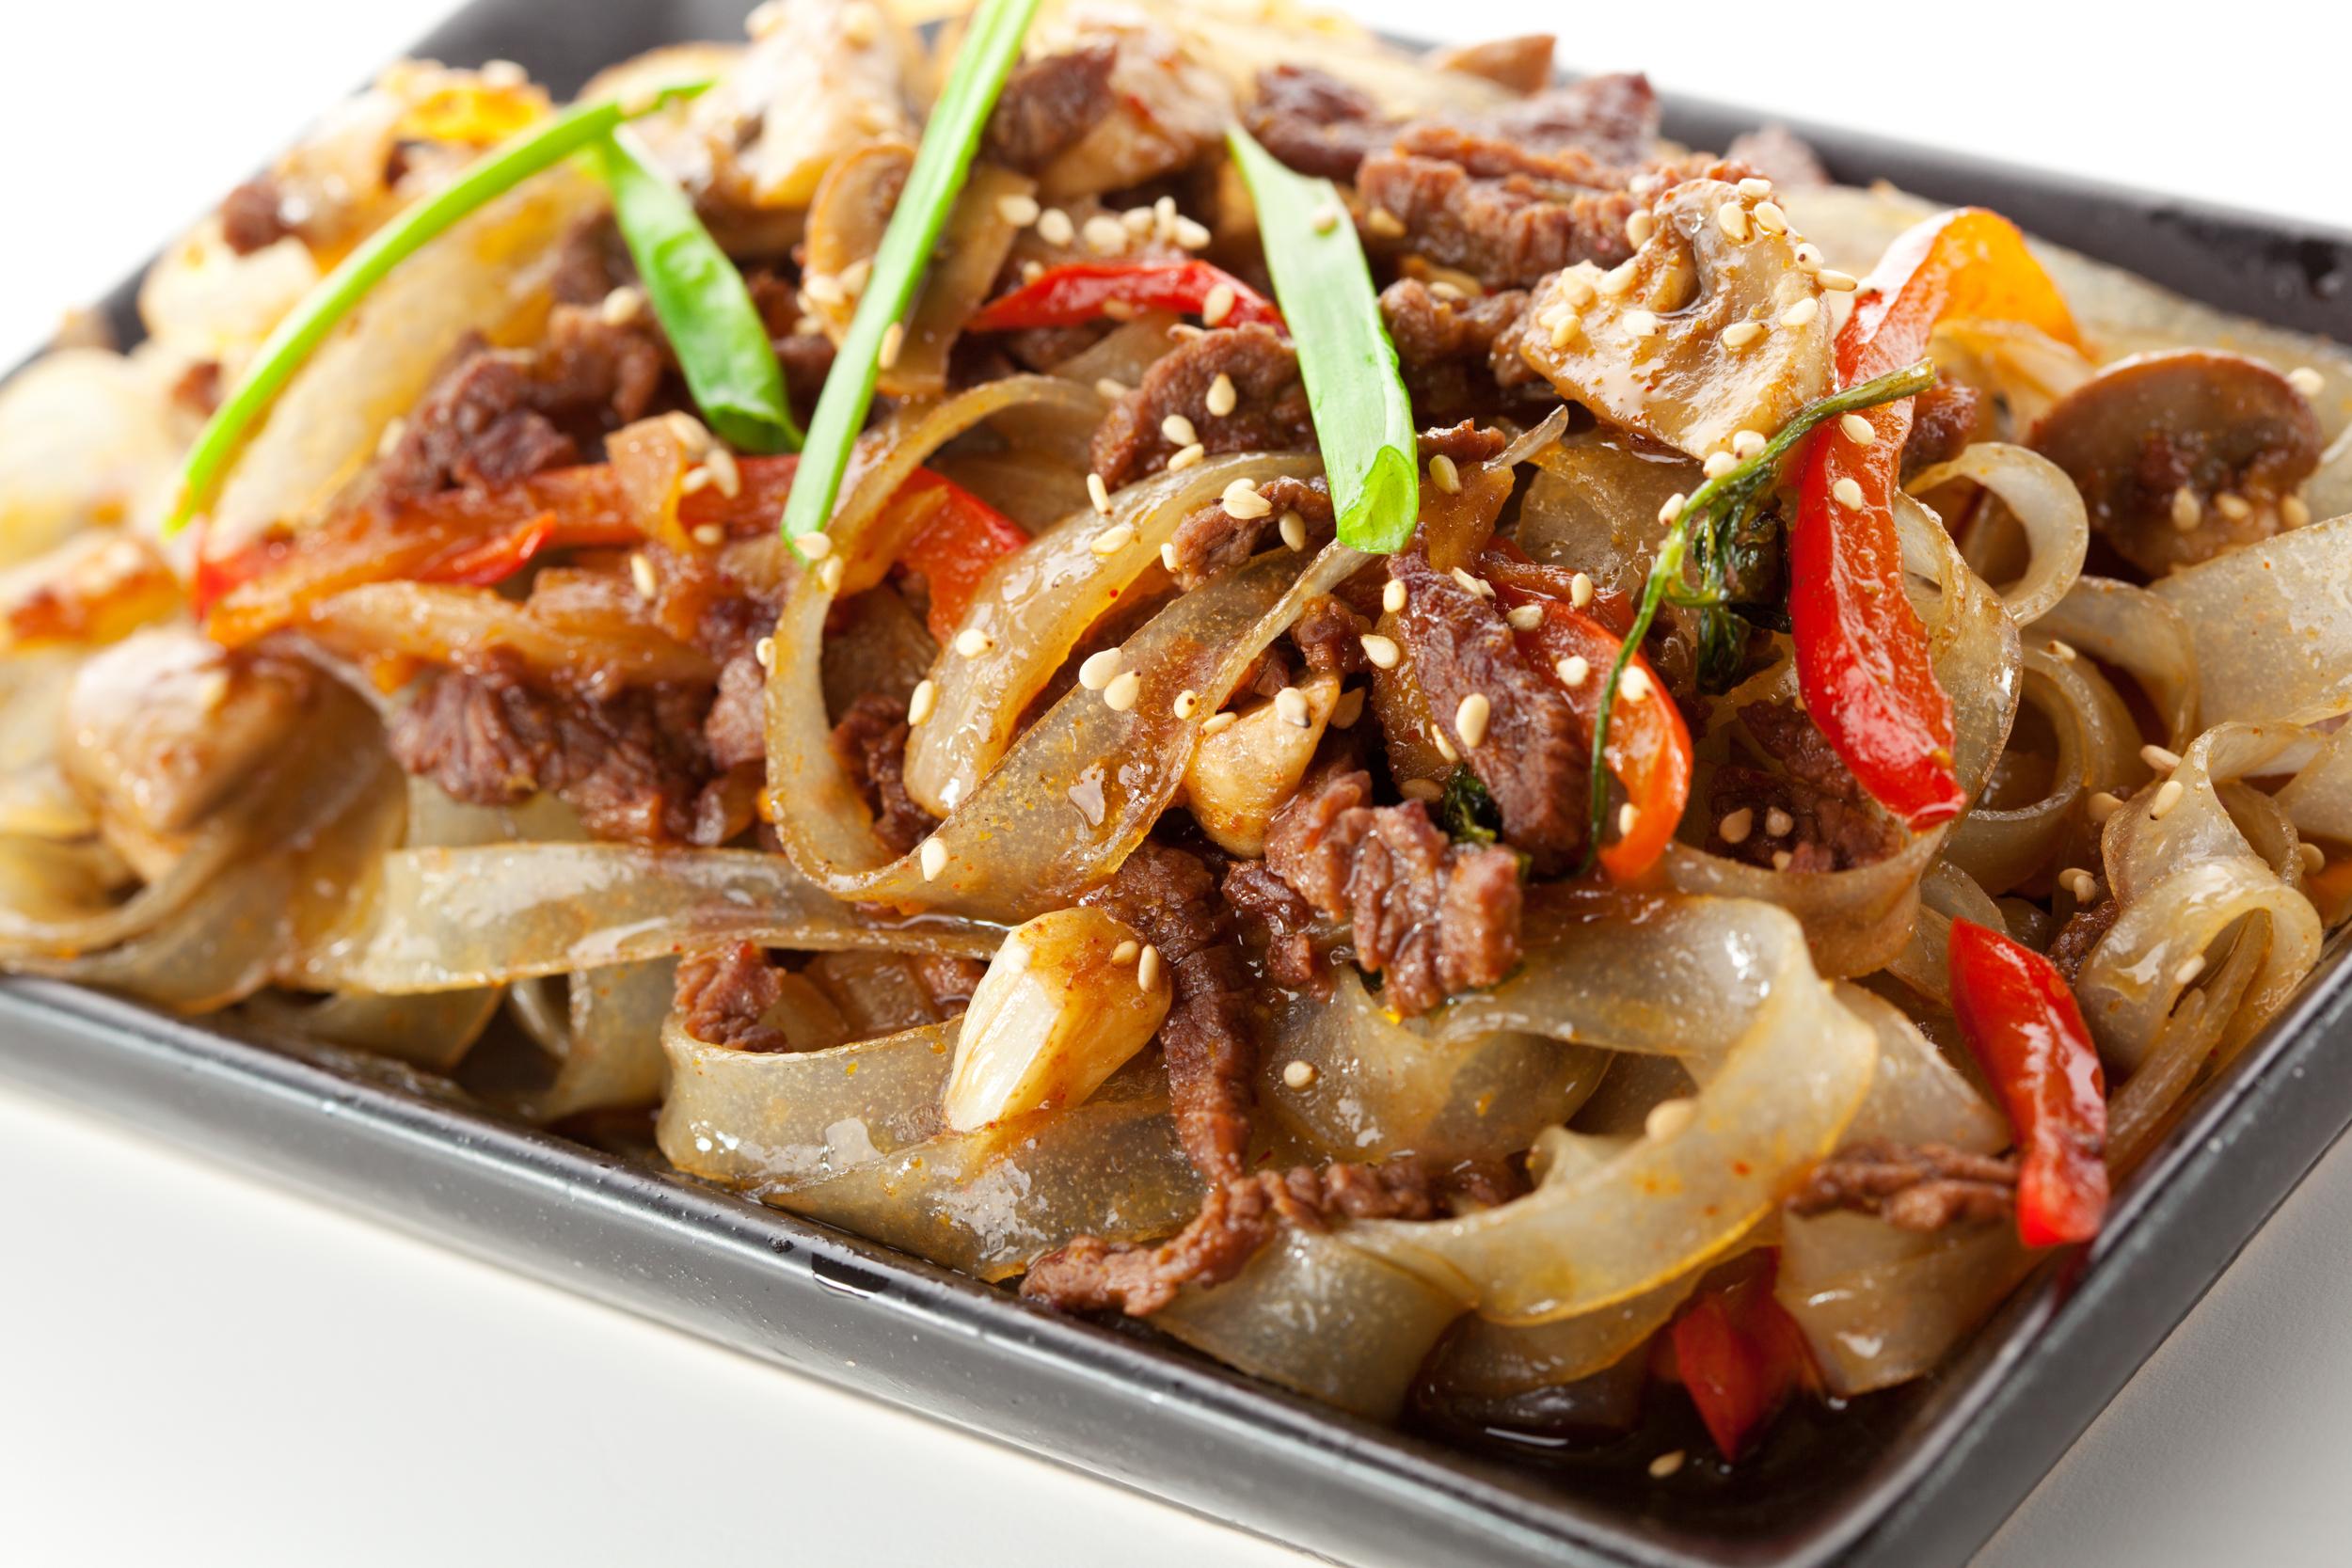 Spicy Beef Stir Fry